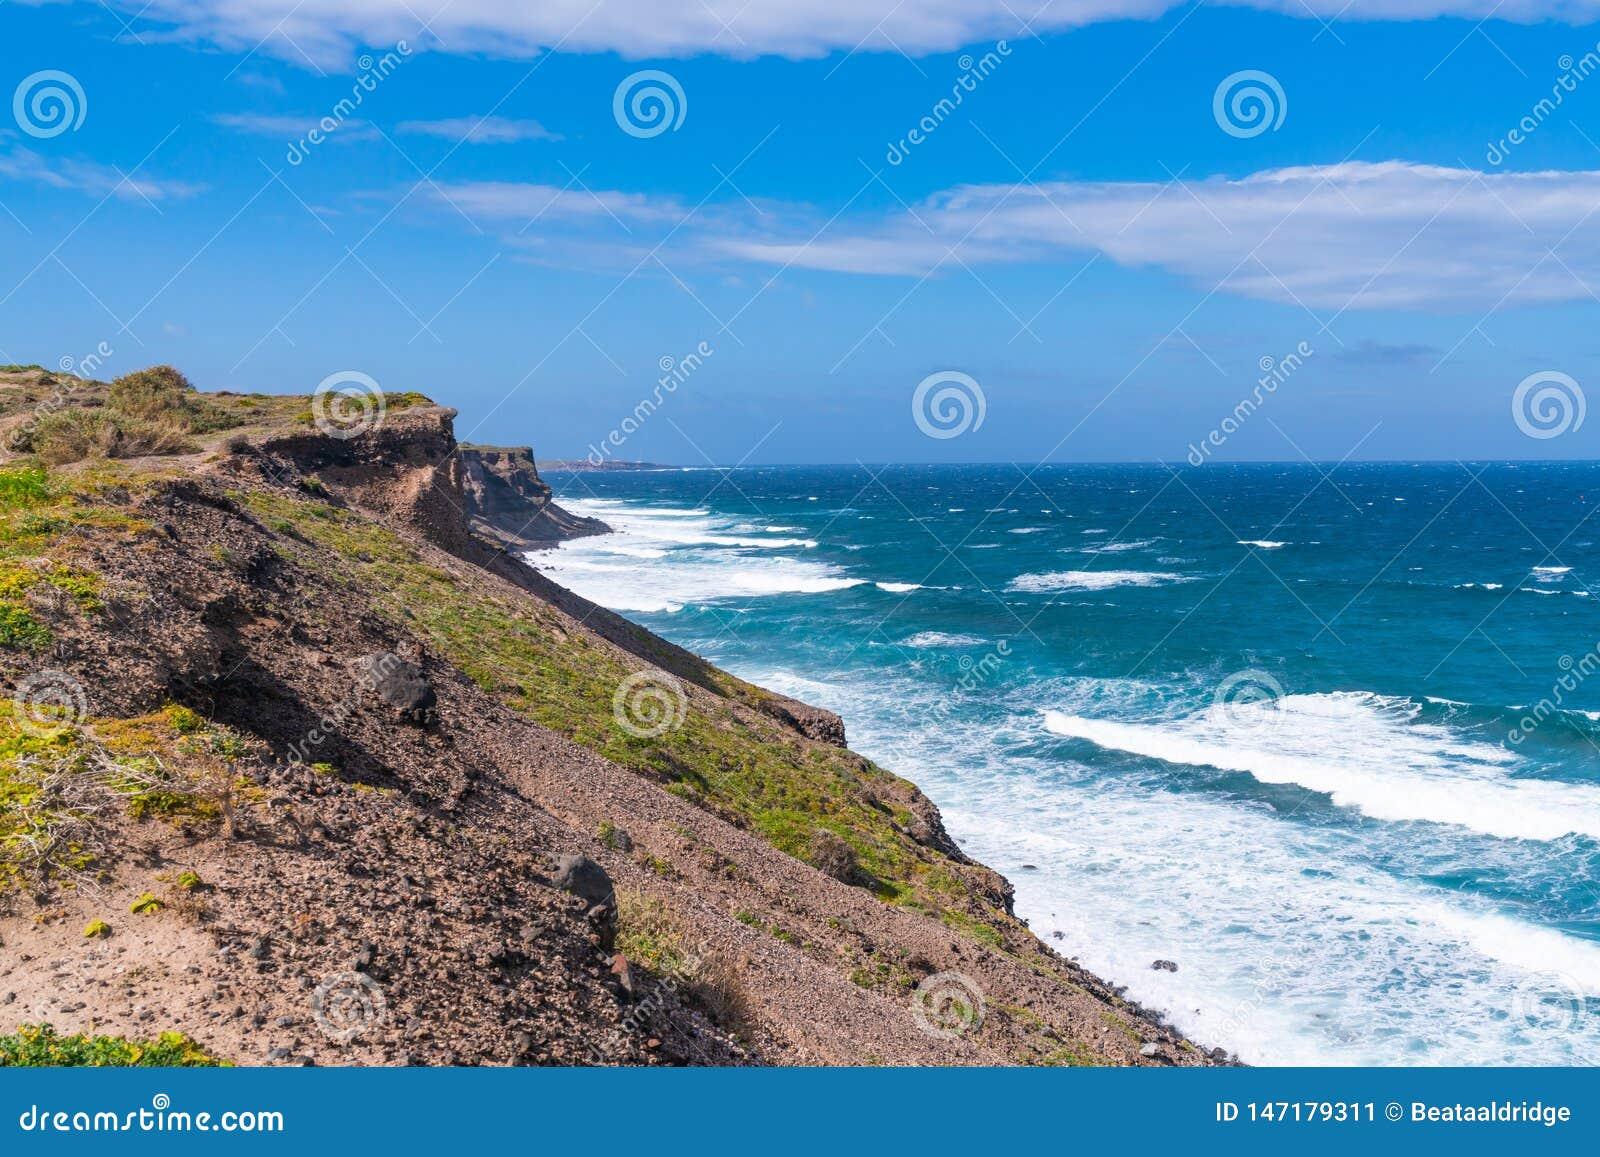 Santorini landscape - view of rugged cliffs and Aegean Sea